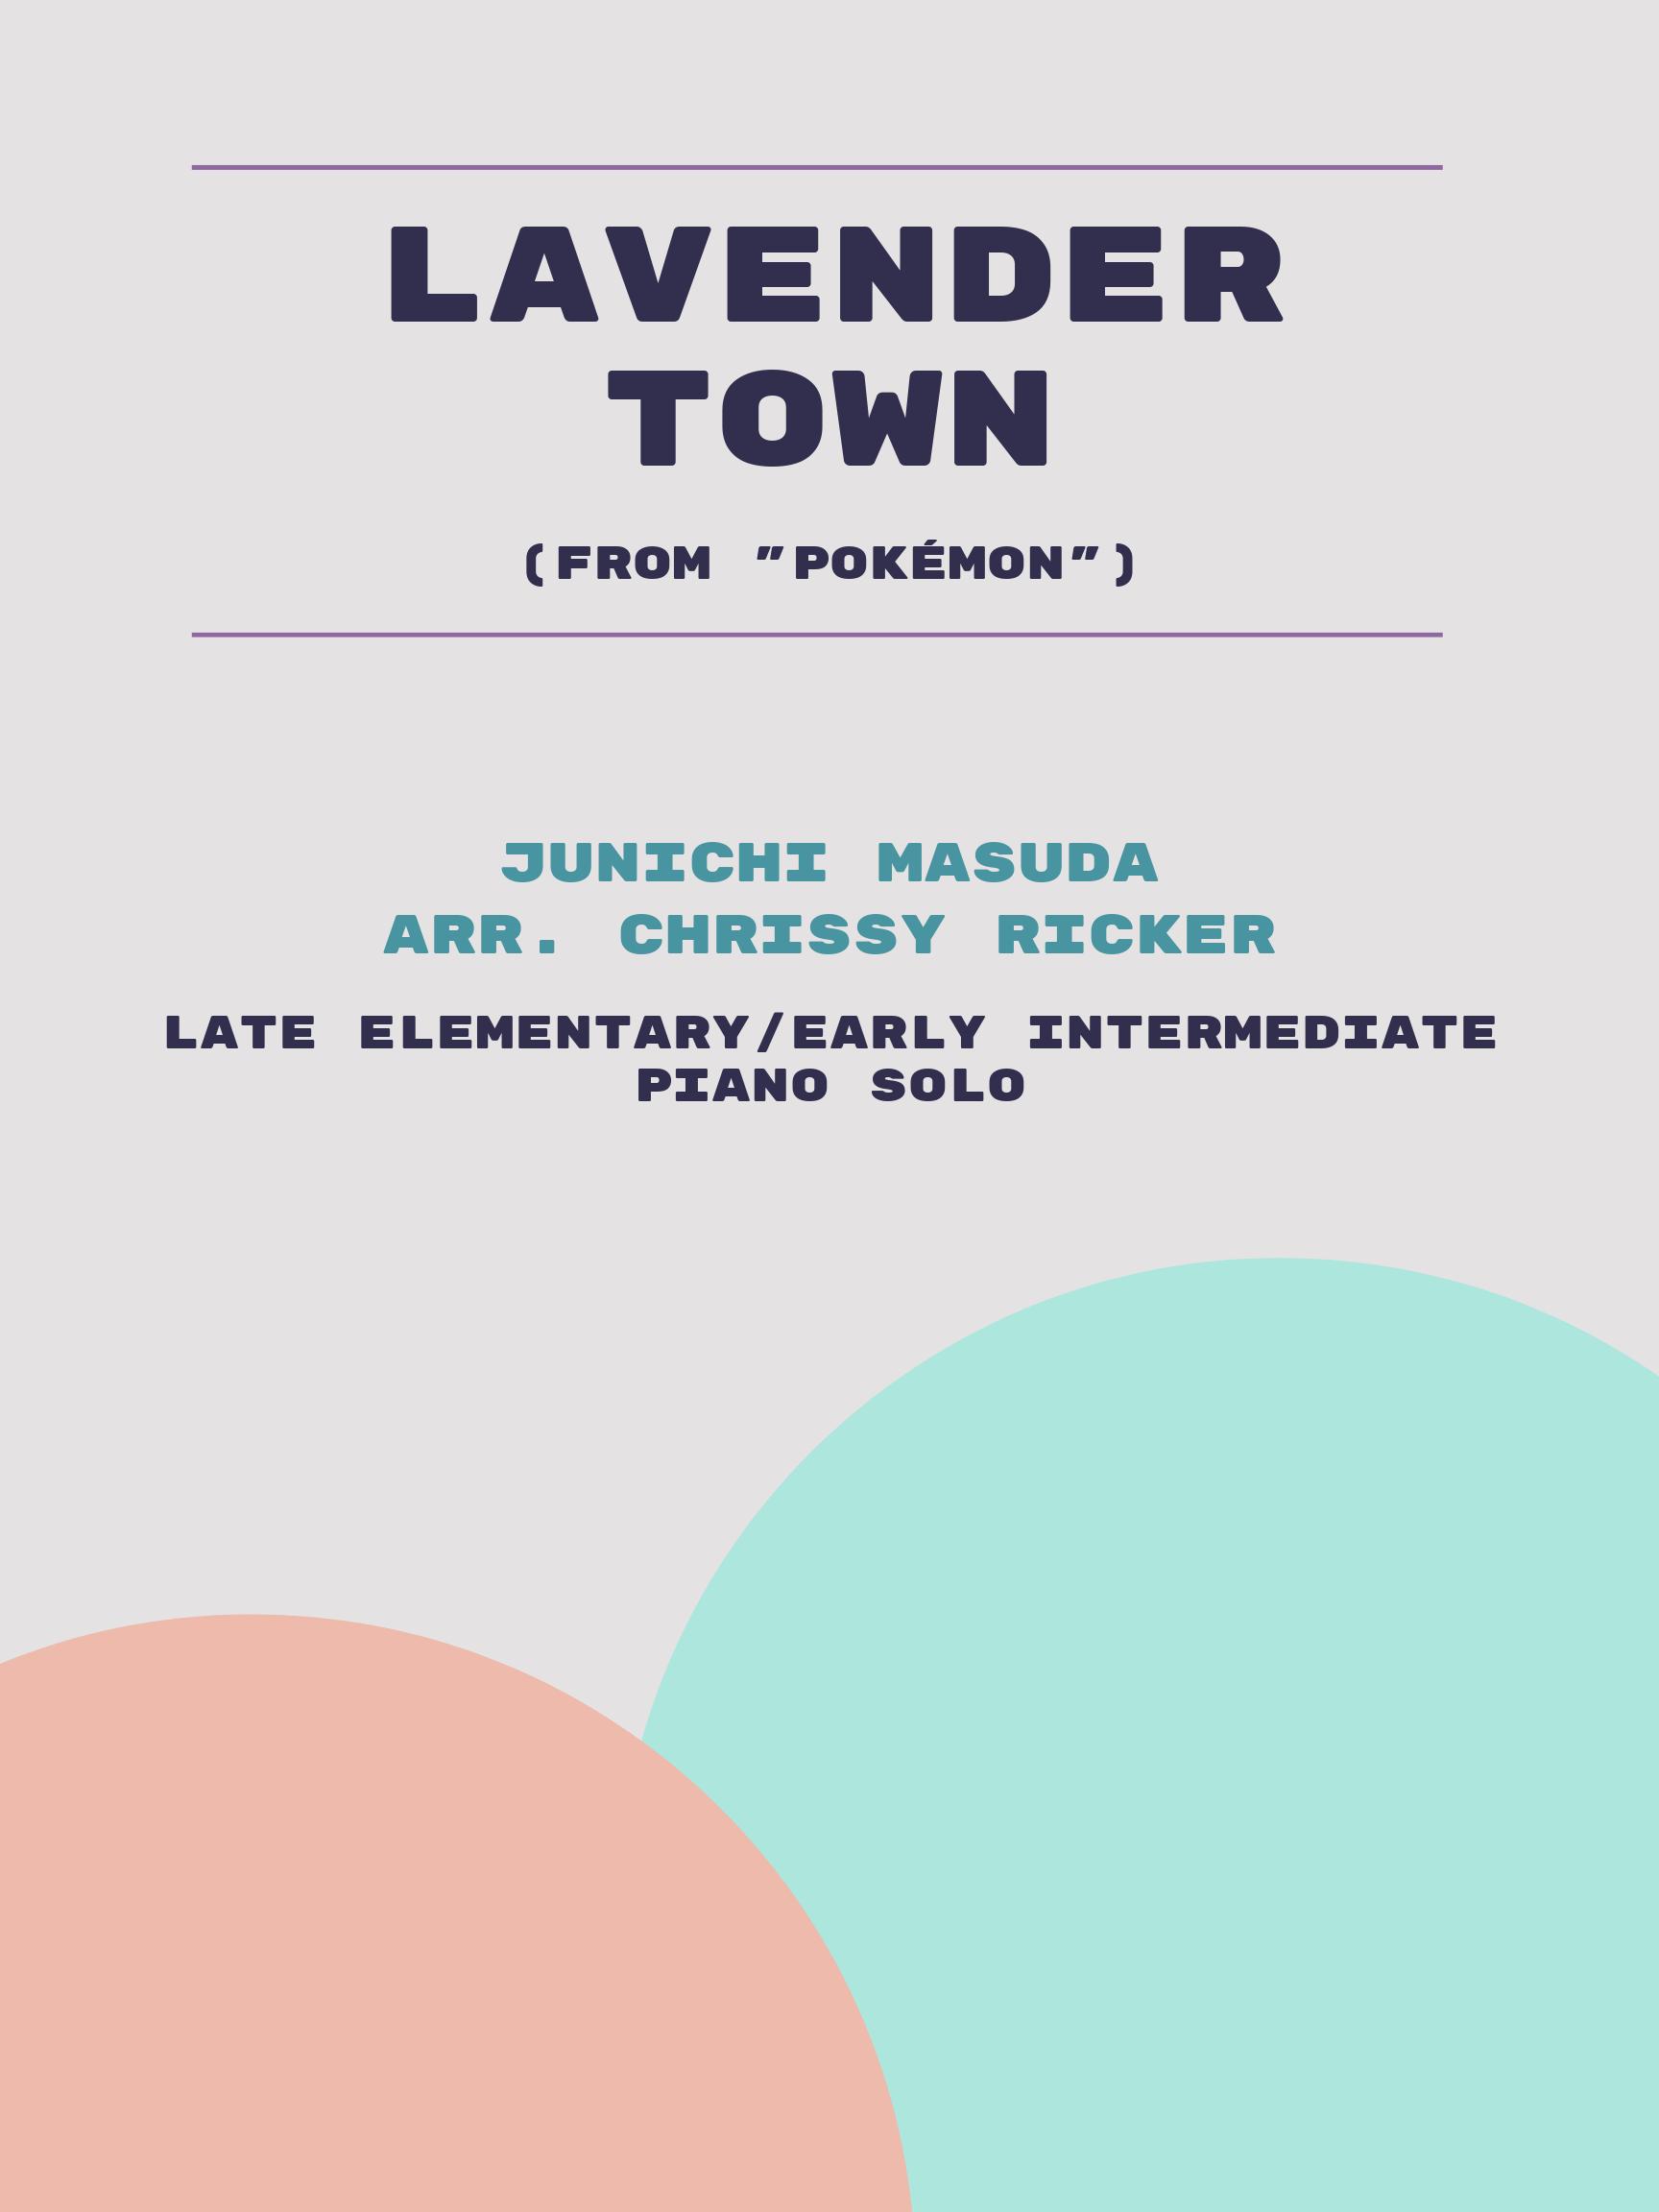 Lavender Town by Junichi Masuda